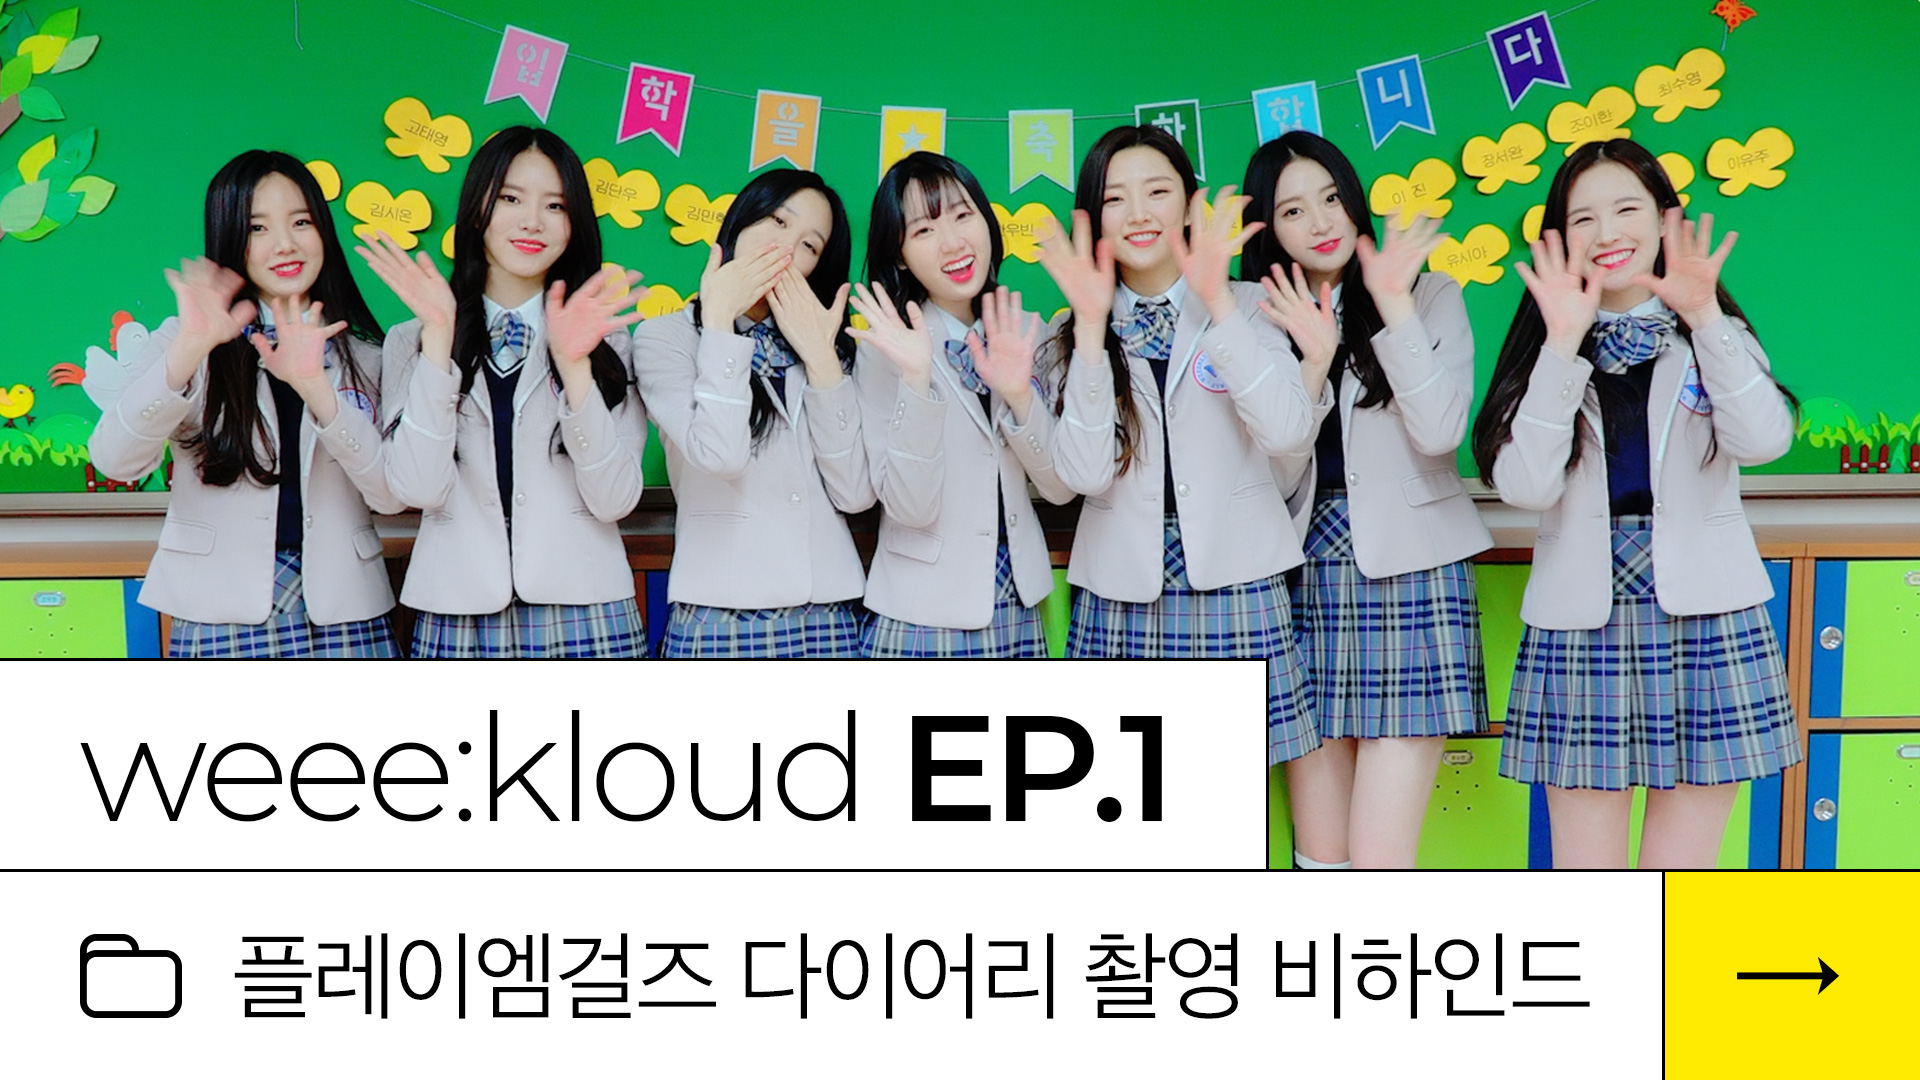 [weee:kloud] EP.1 플레이엠걸즈 다이어리 촬영 비하인드